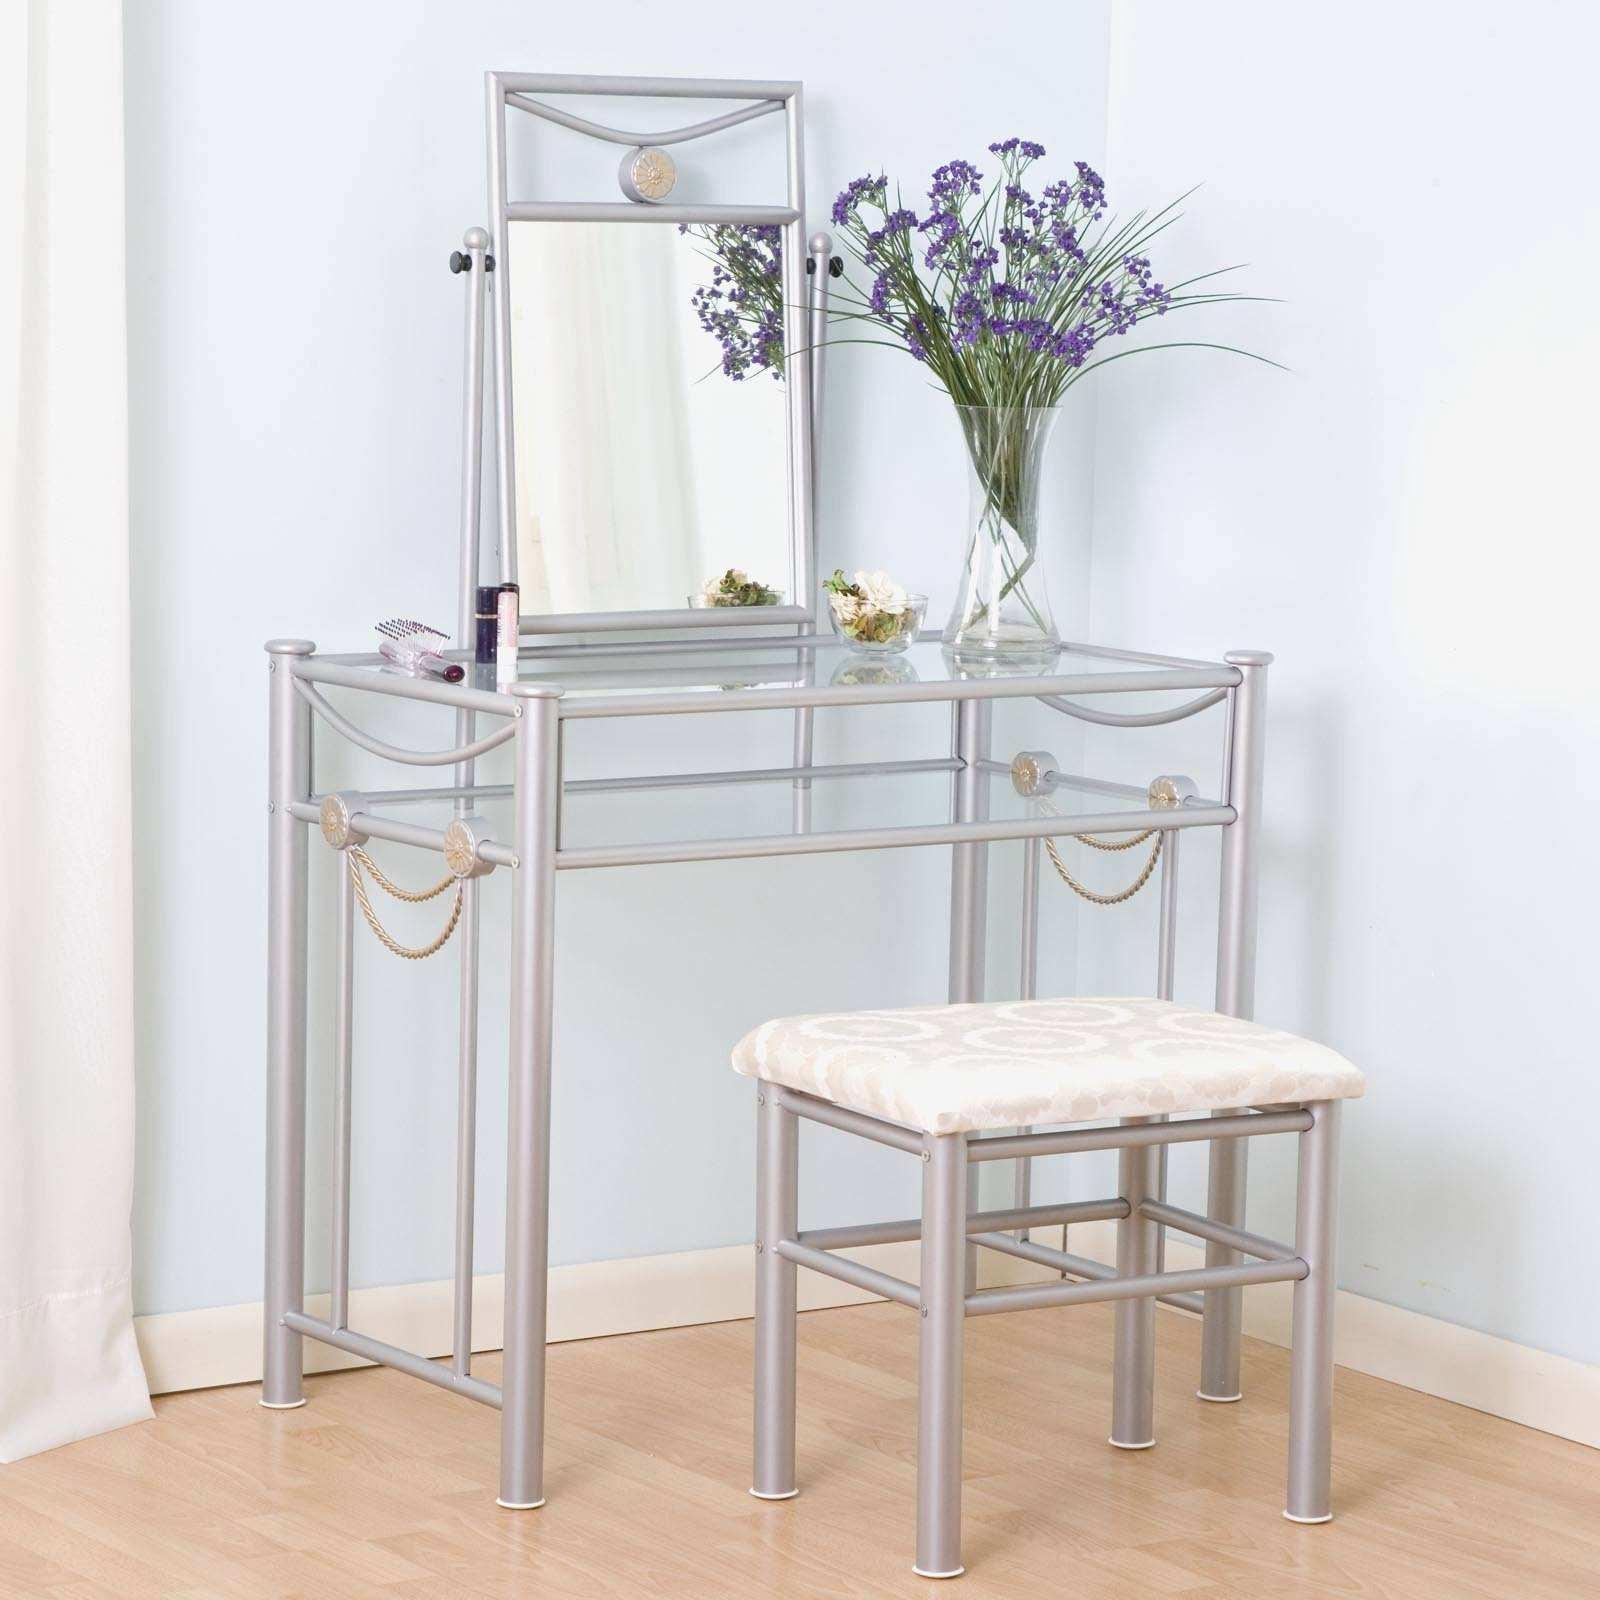 Small Bedroom Vanity Elegant Glass Makeup Table House Plans 148197